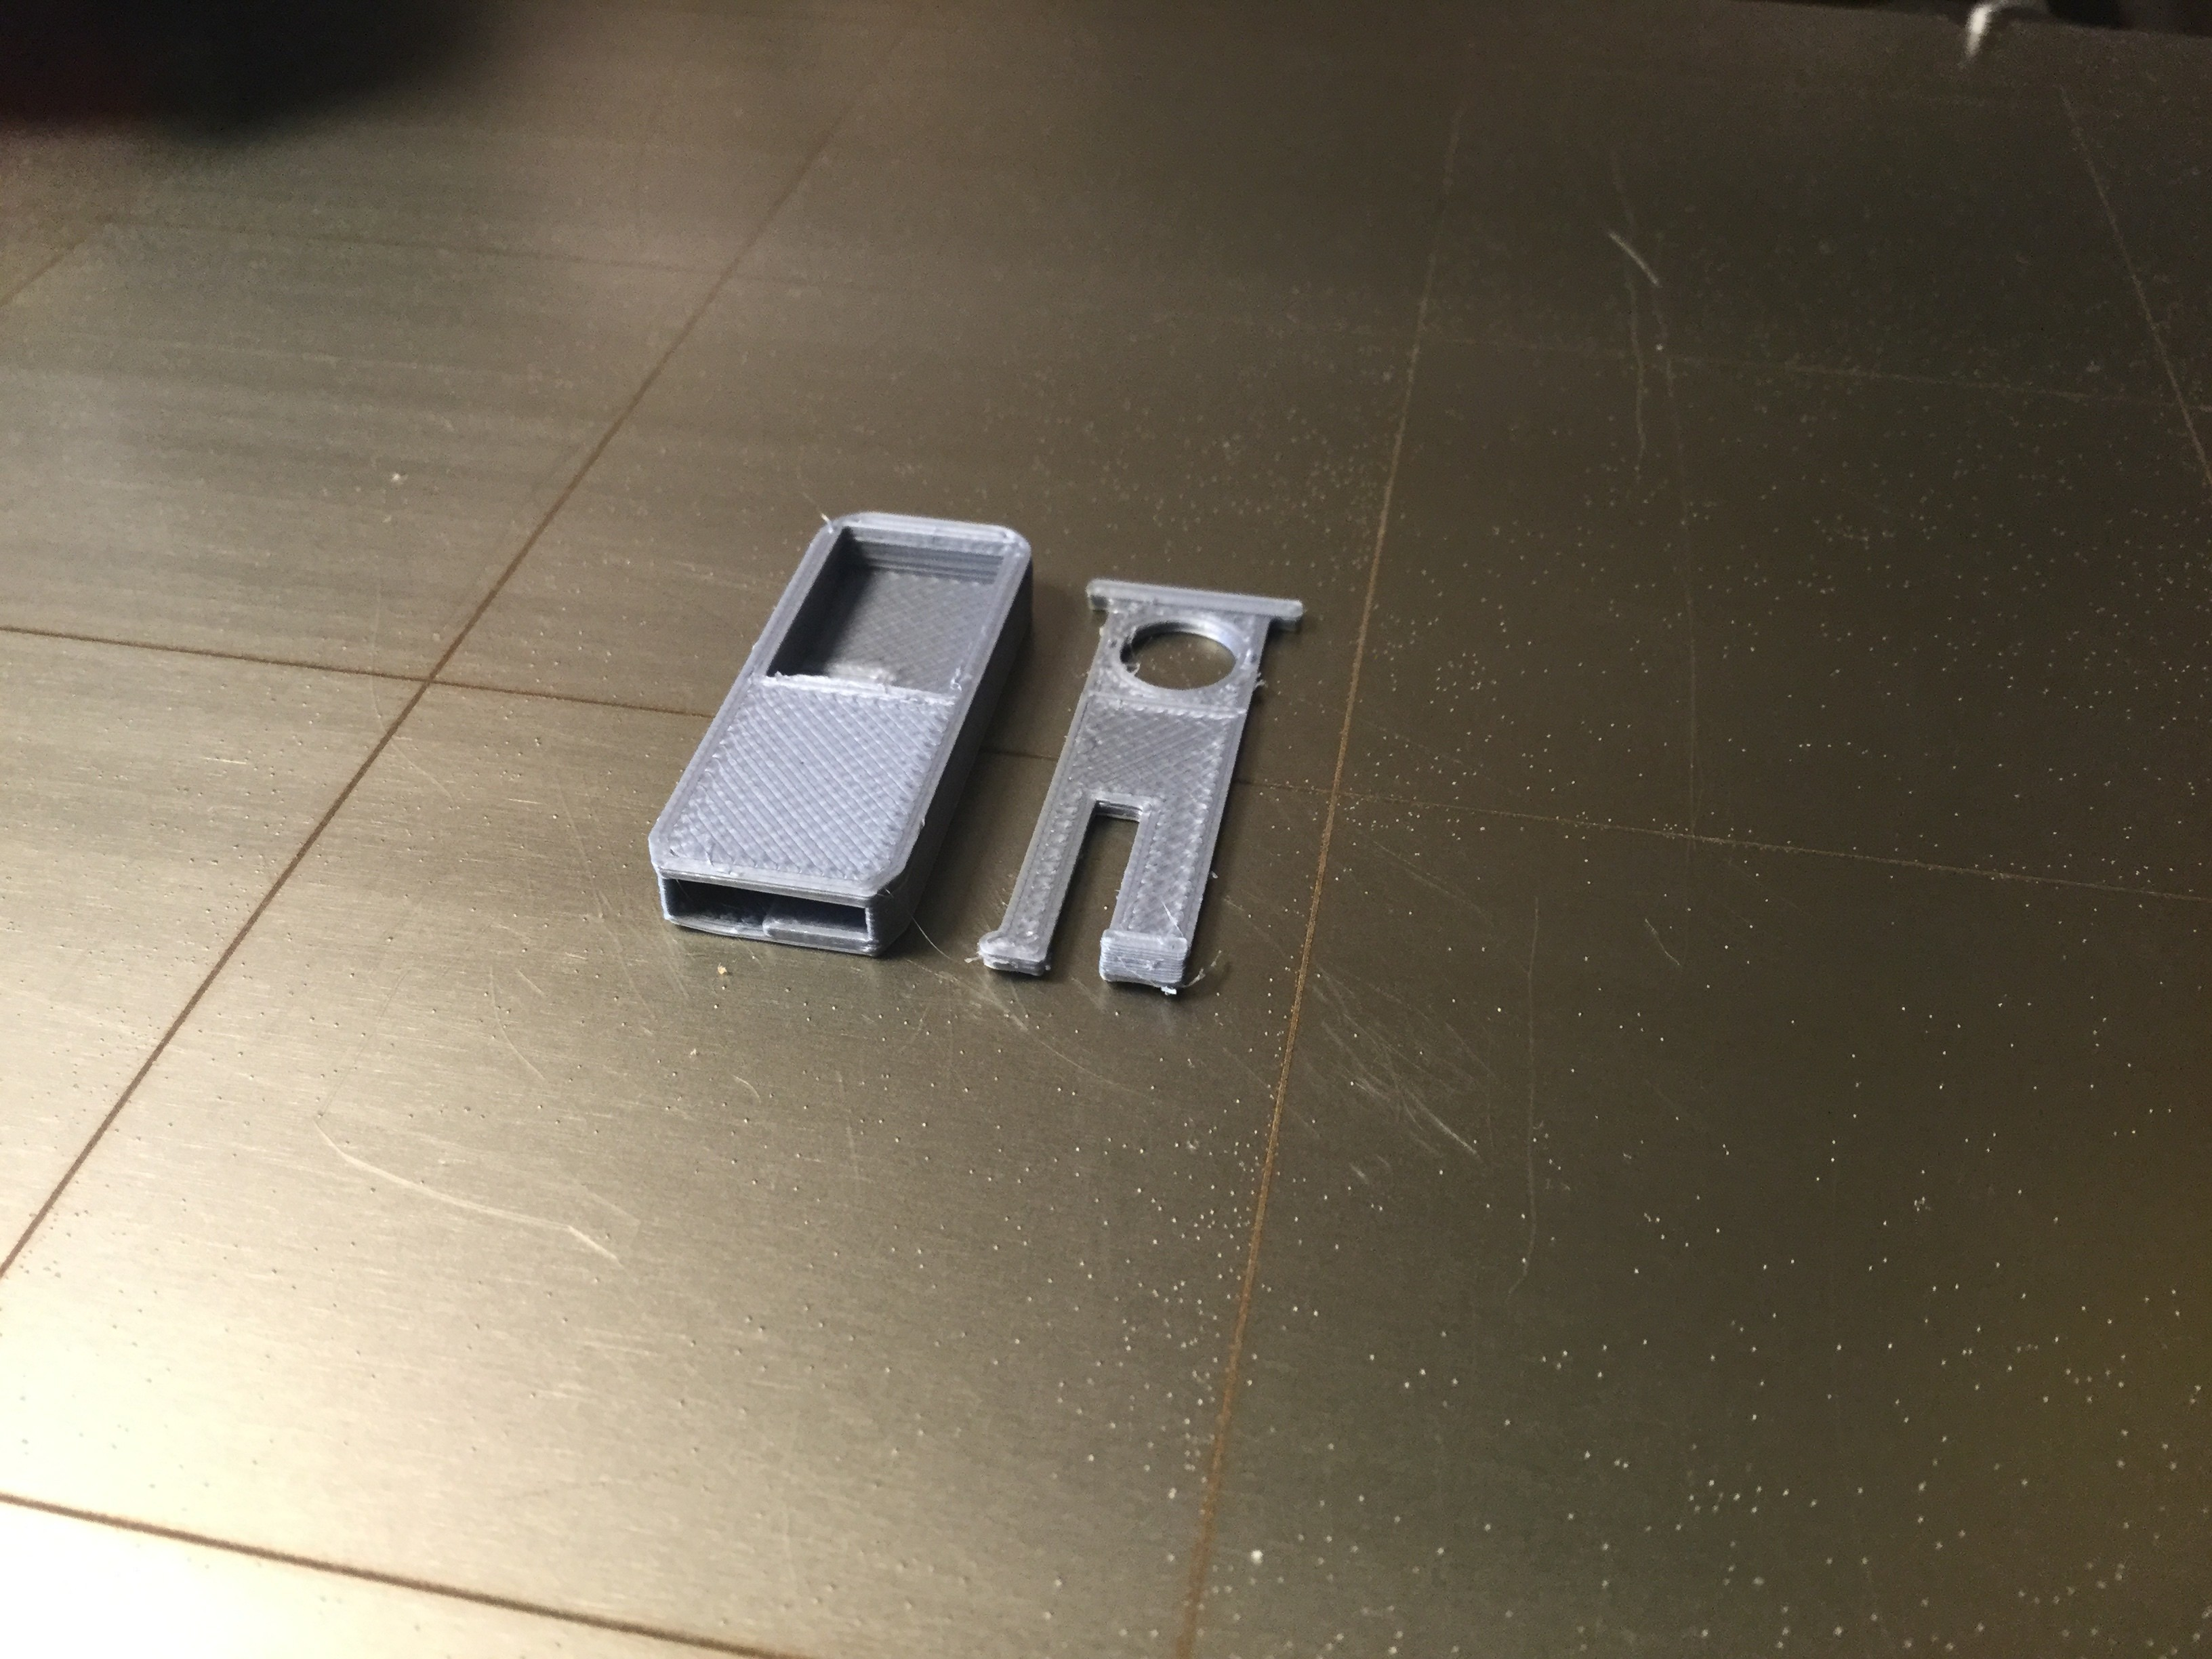 A5CBA521-5412-4358-ADD4-2ACBAC4B8C0C.jpeg Download free STL file Network Bonnet • 3D printing template, tupa